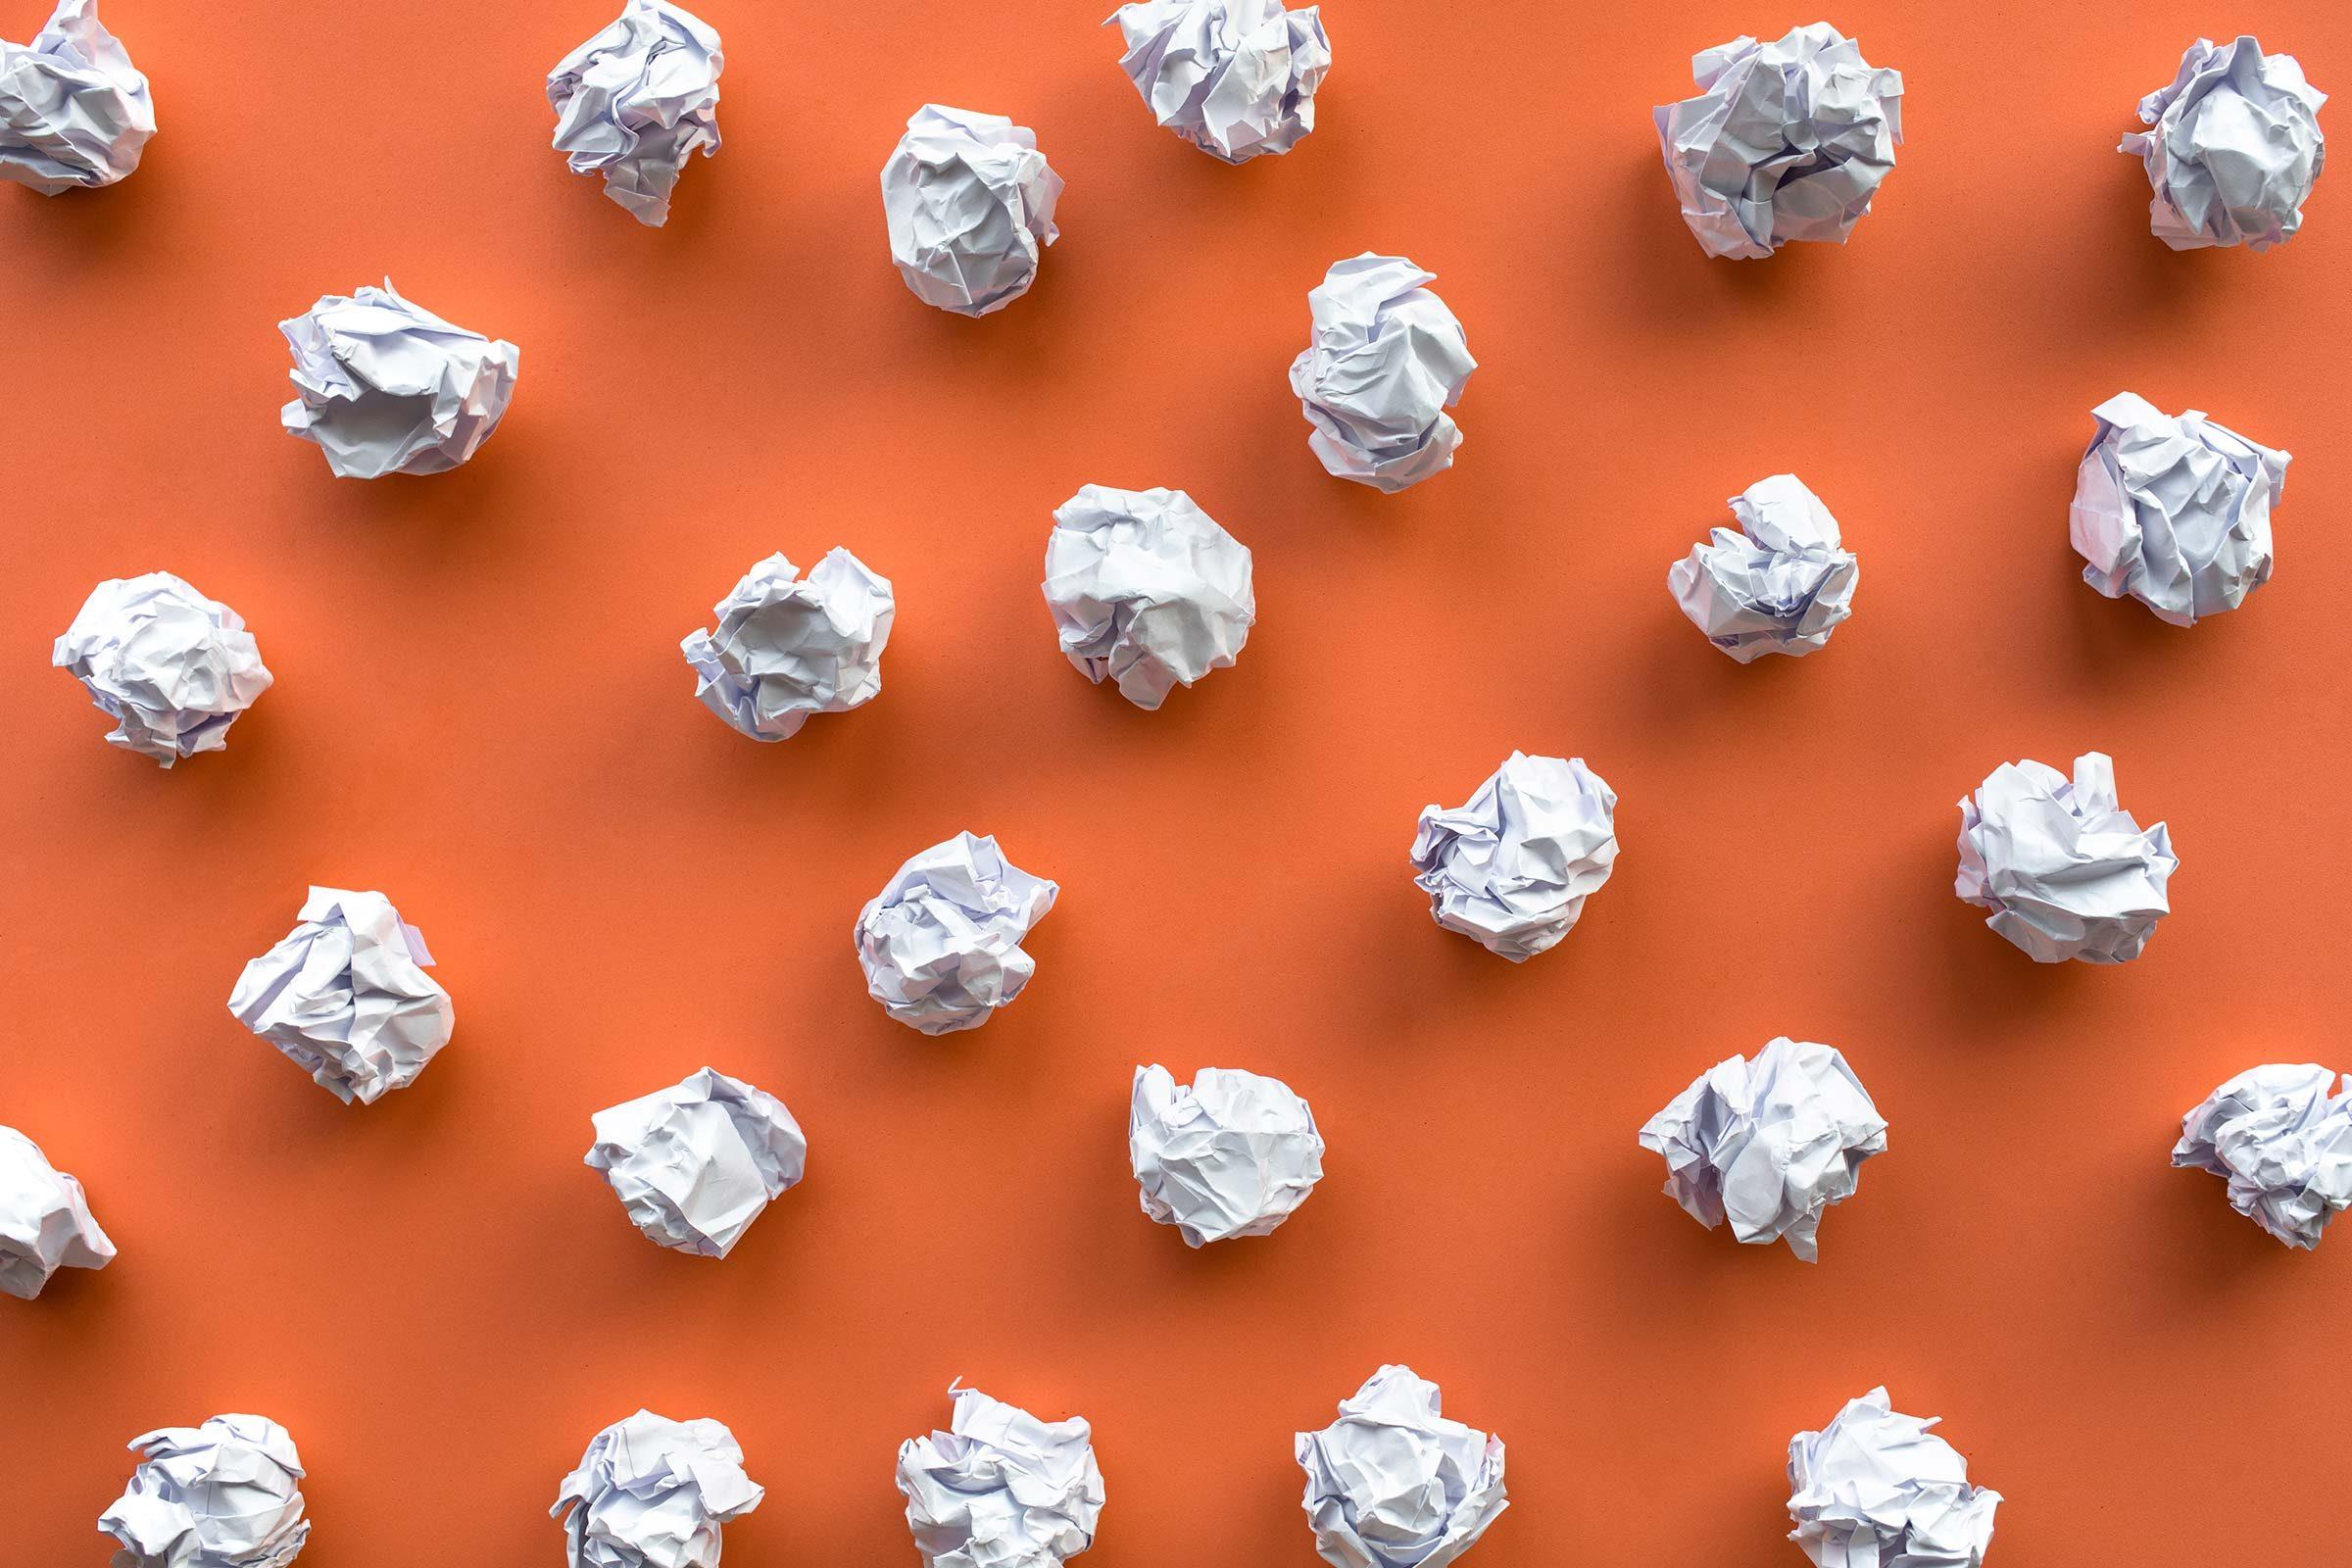 crumpled paper pattern